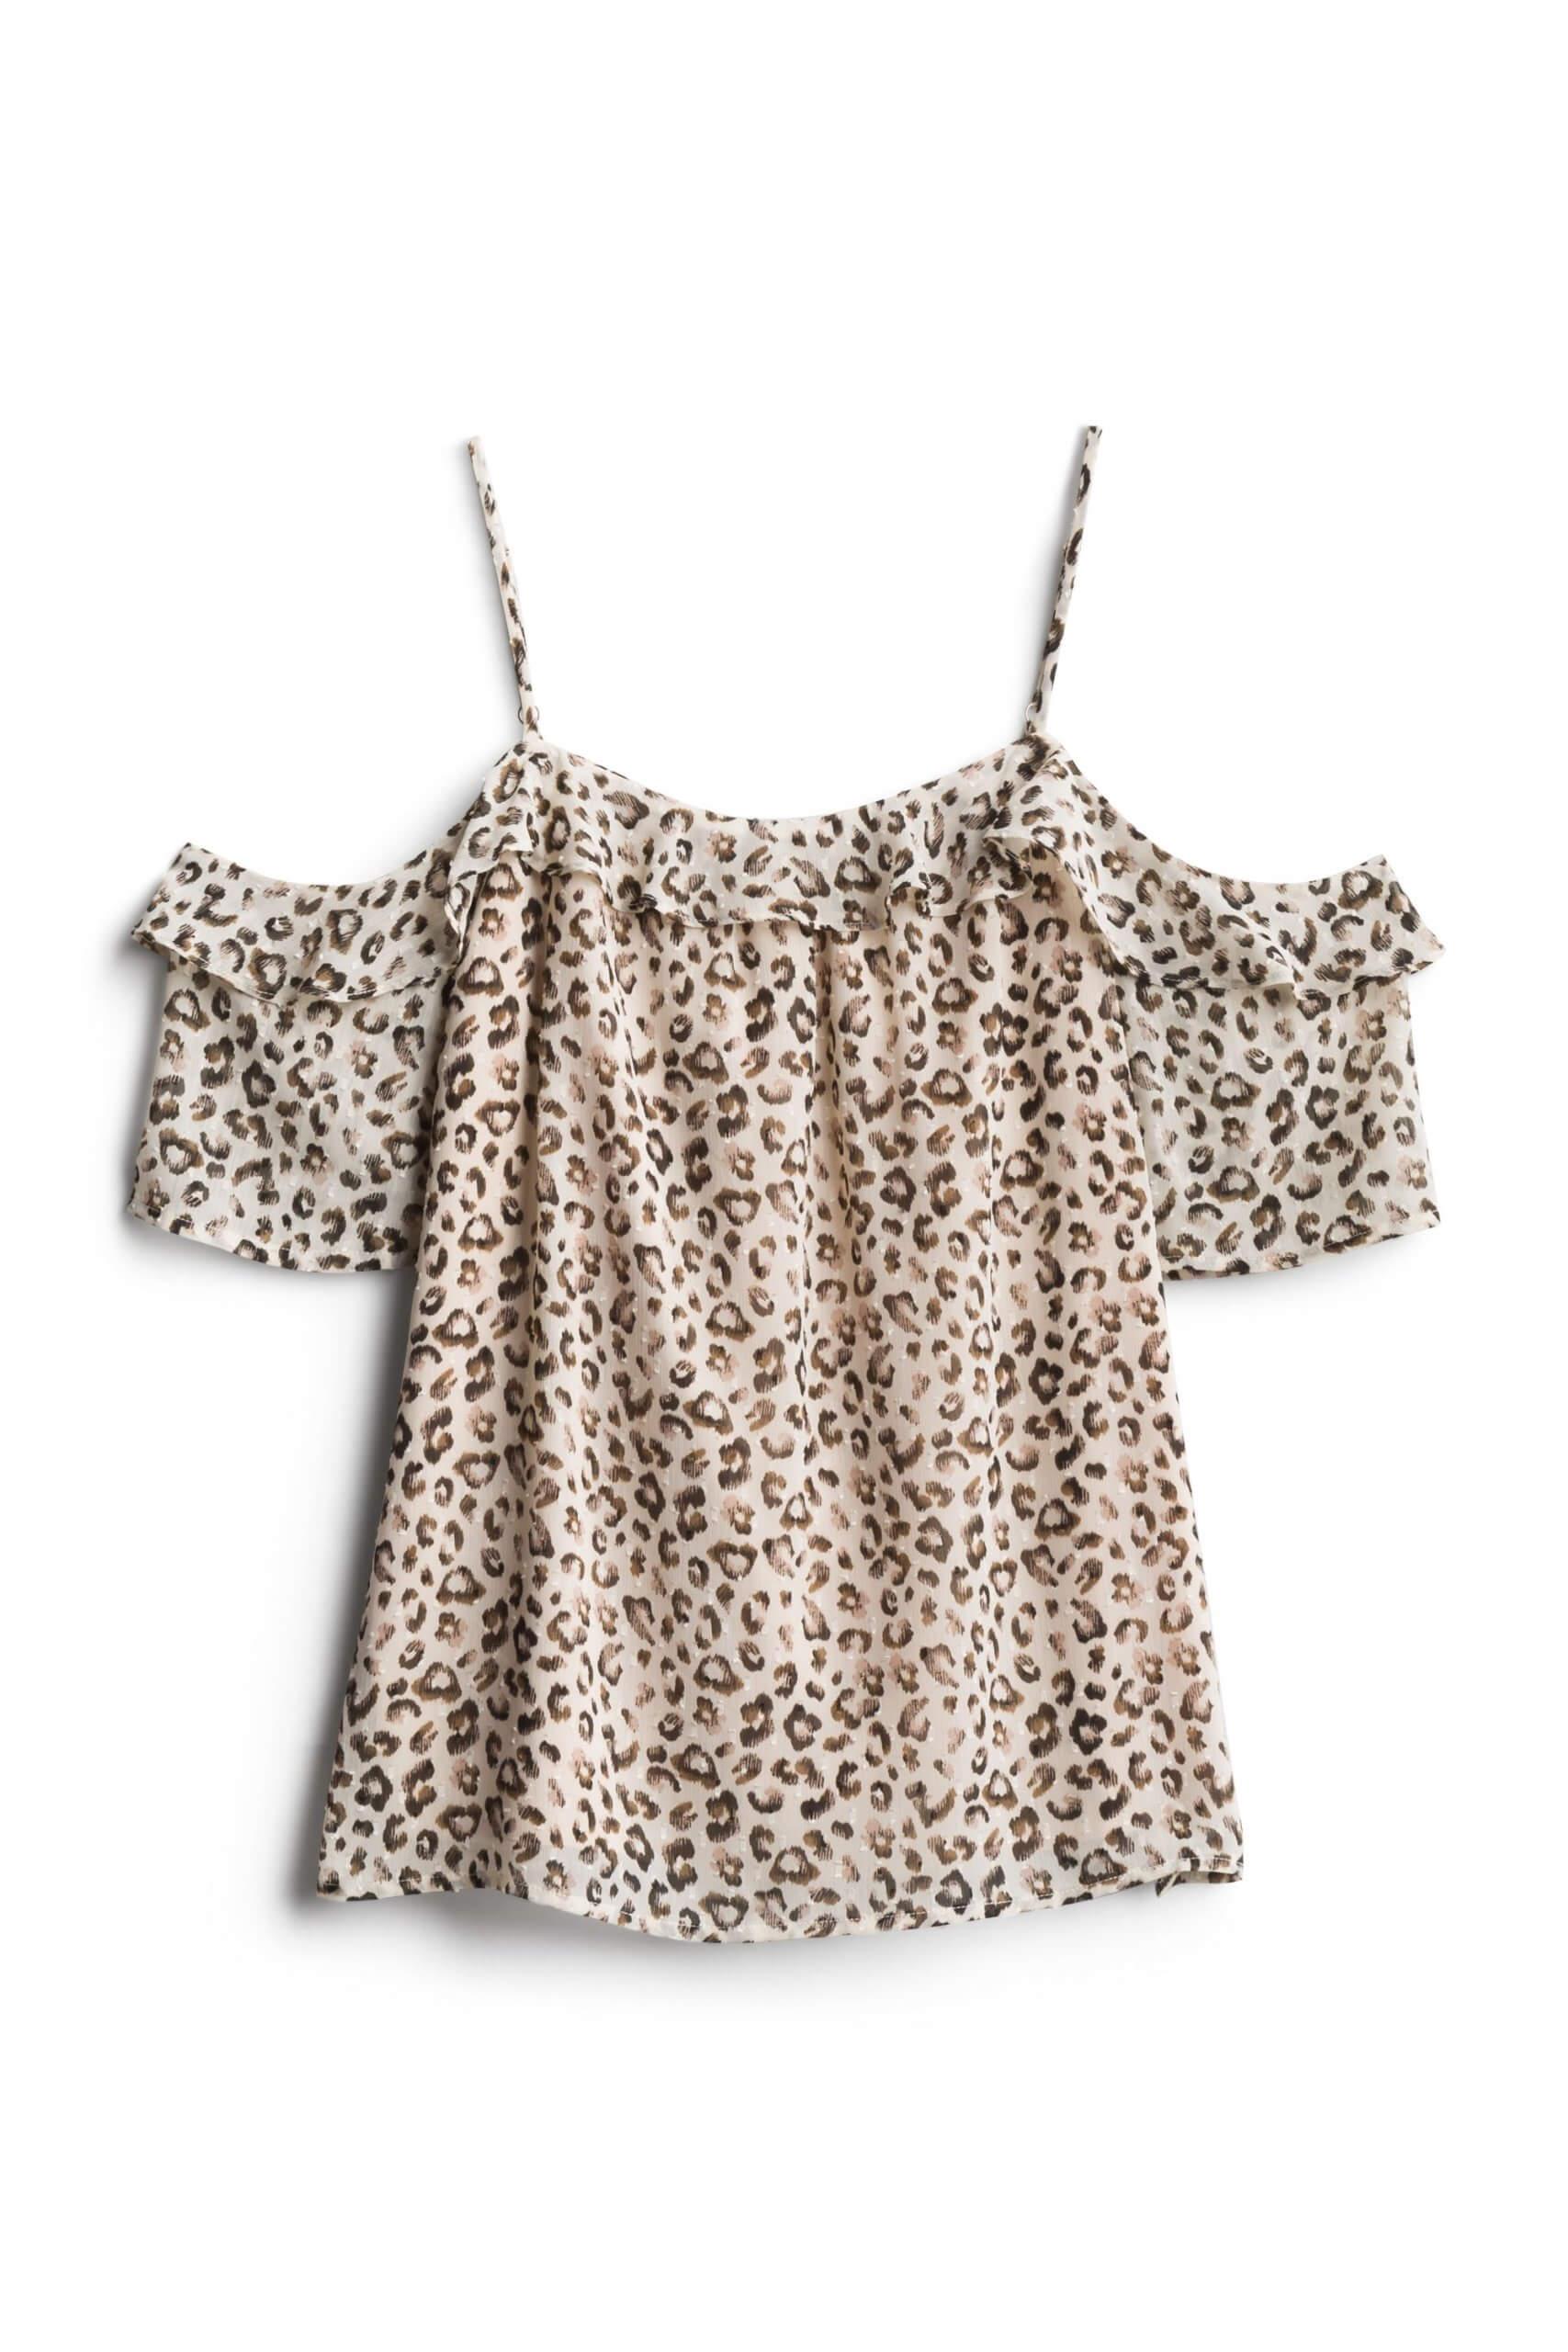 Stitch Fix Women's tan animal-print cold shoulder top.